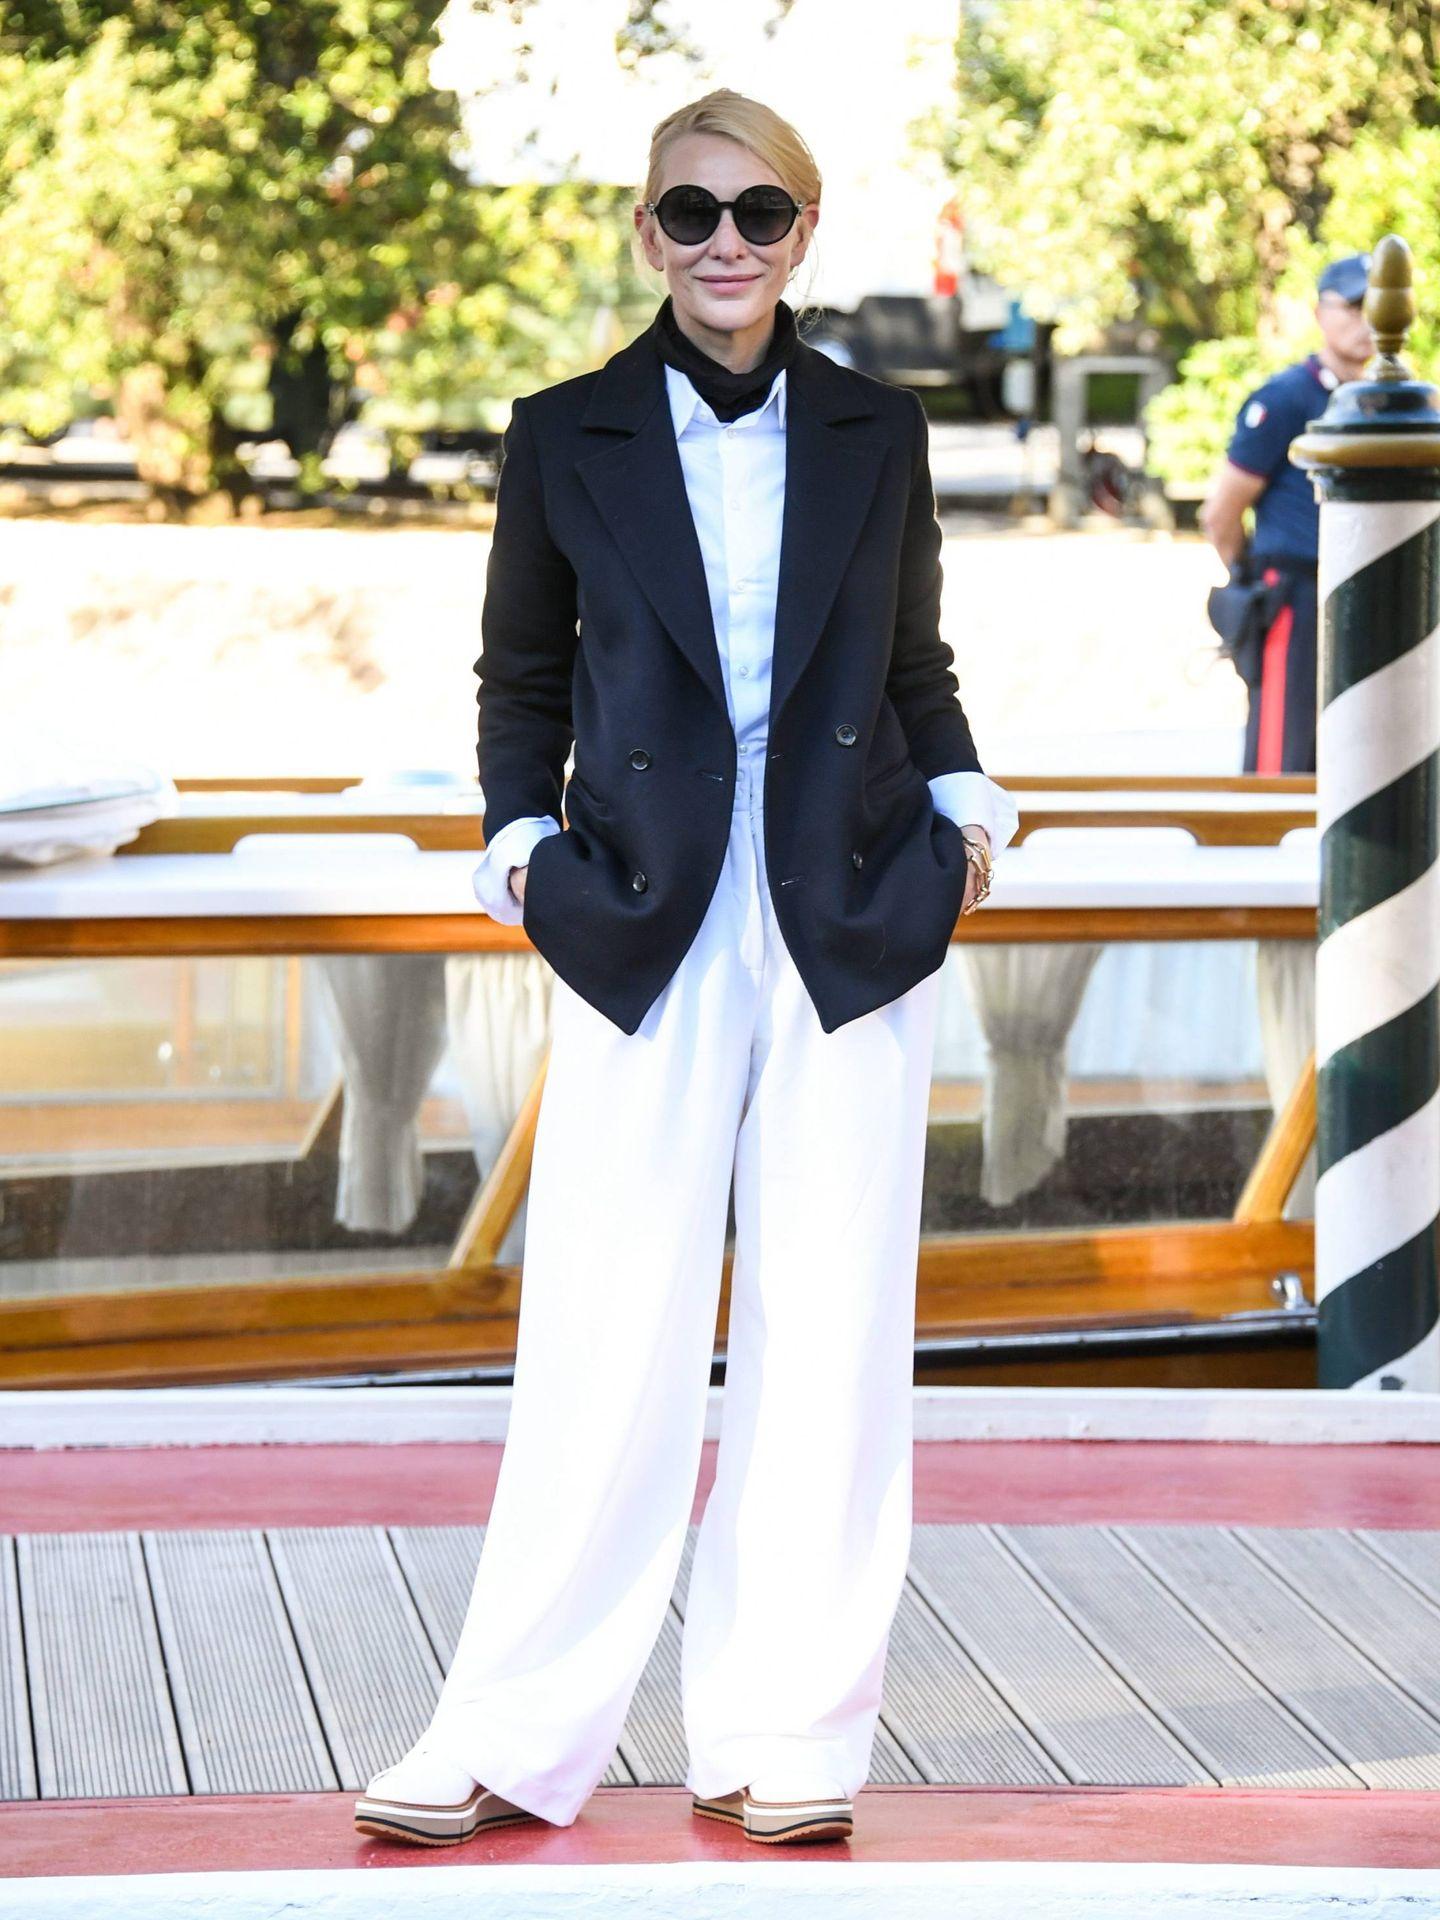 El look de Cate Blanchett al completo. (Cordon Press)